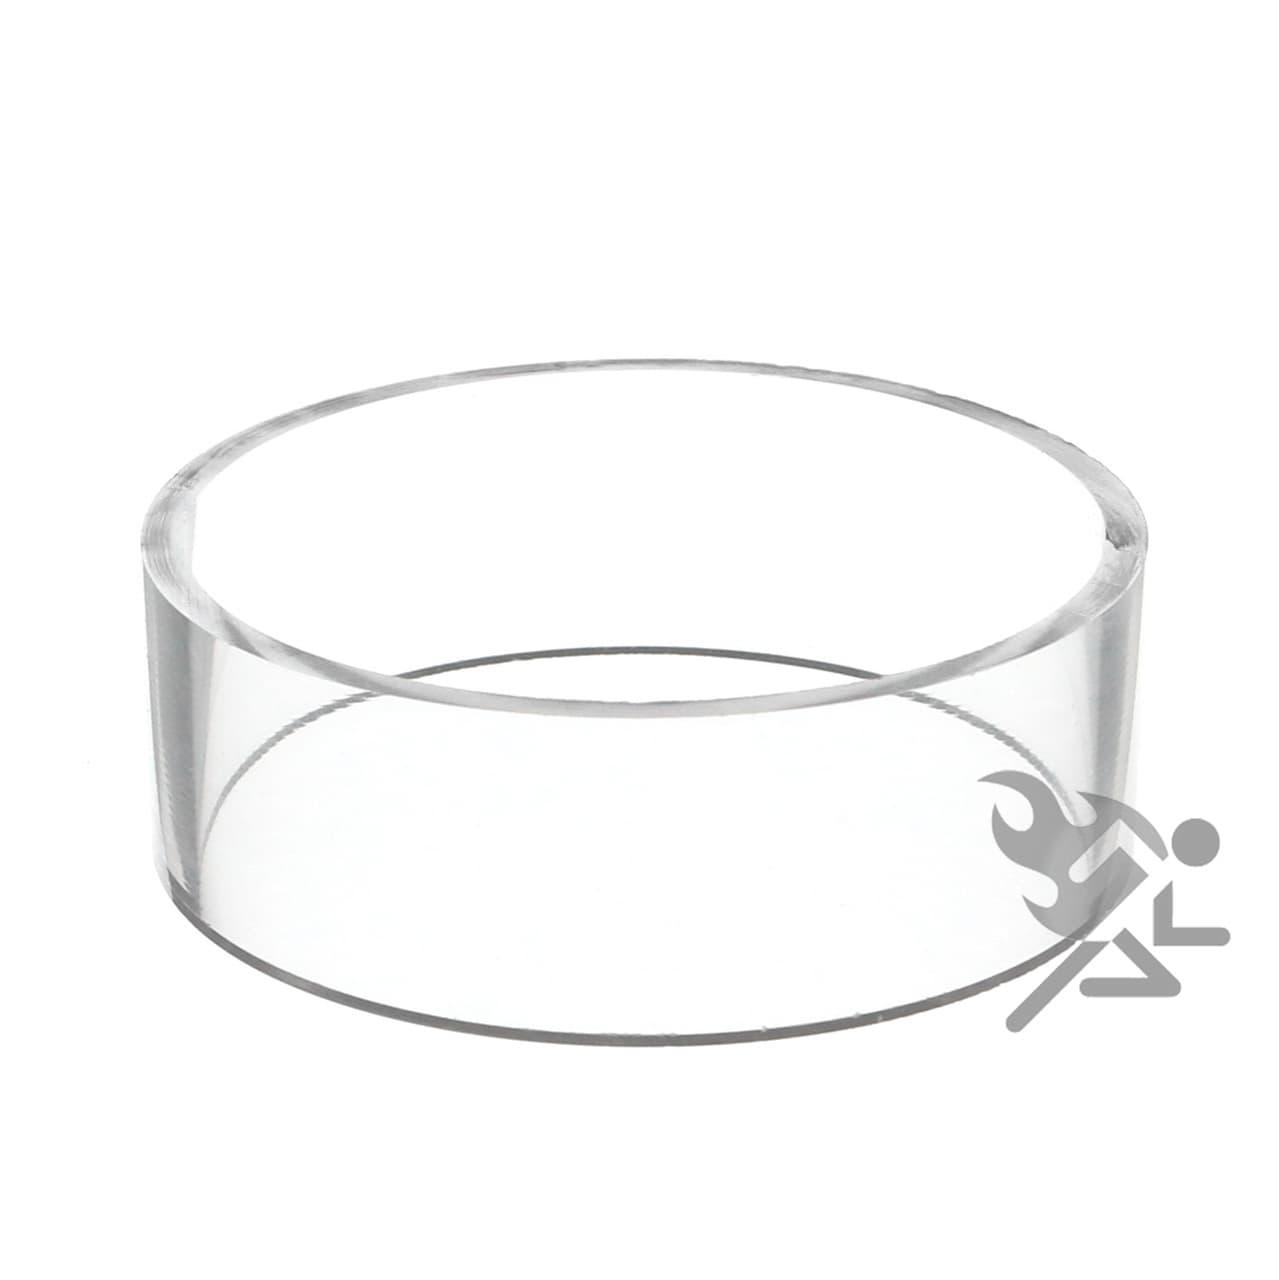 Acrylic Ring, 3″dia x 2″h